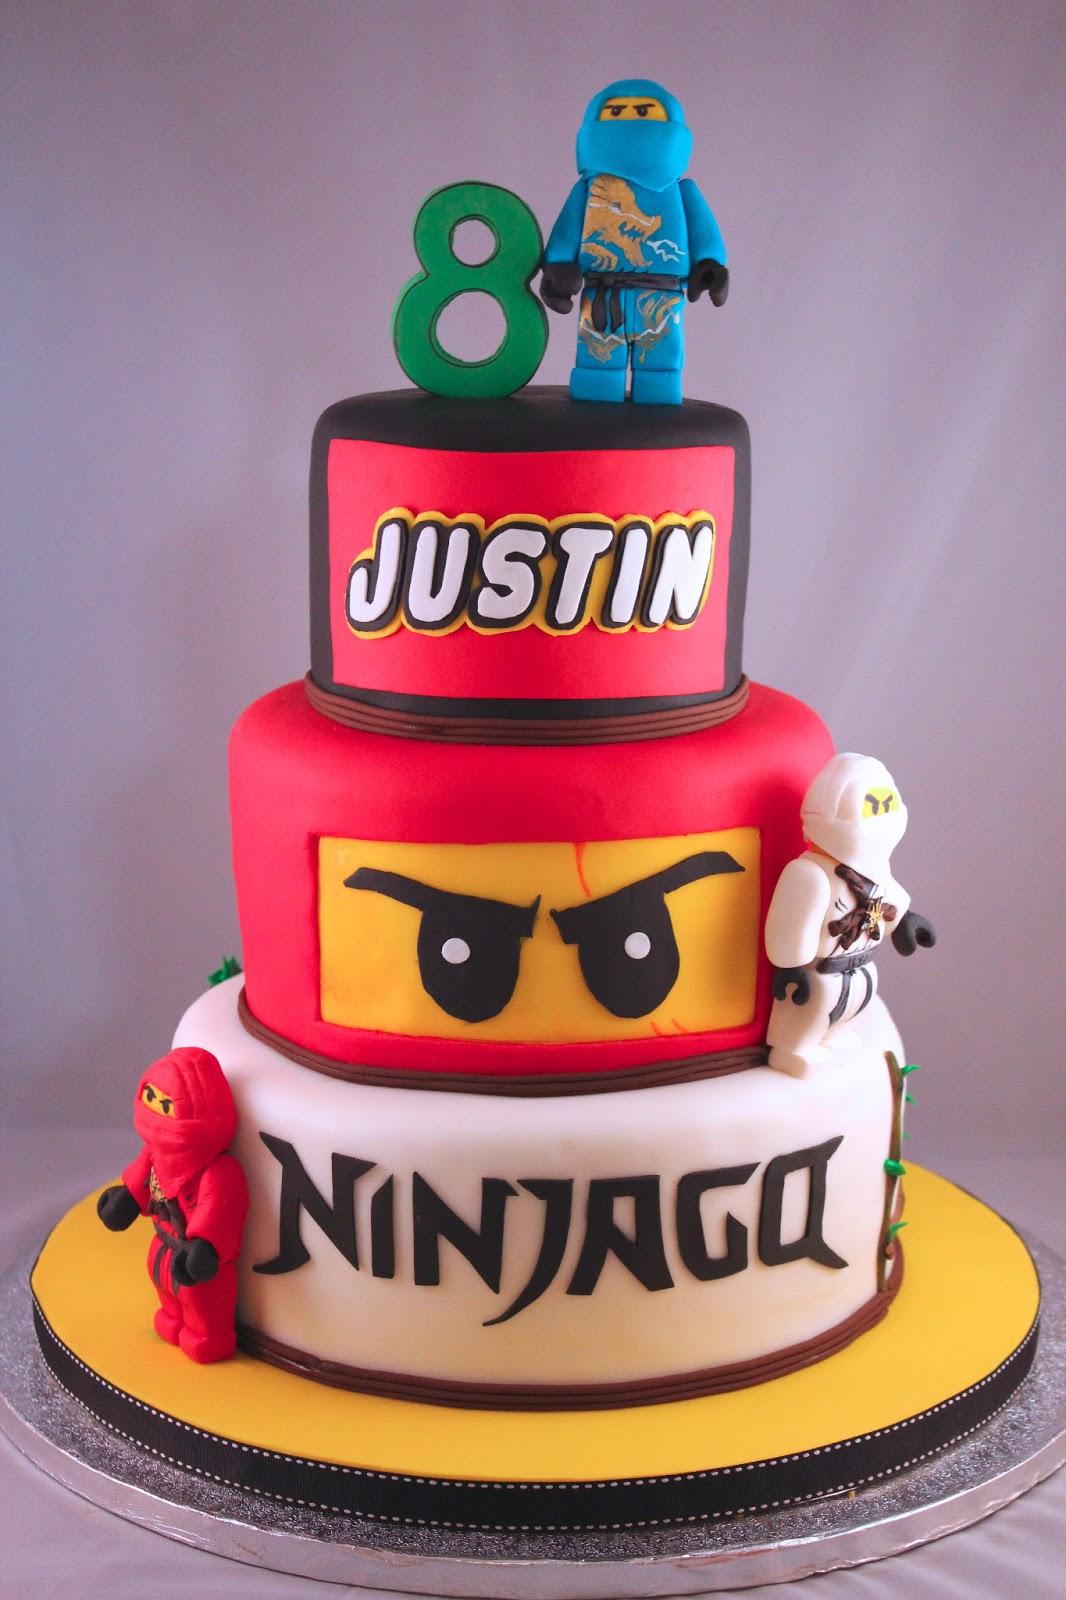 Lego Cake Decorating Supplies